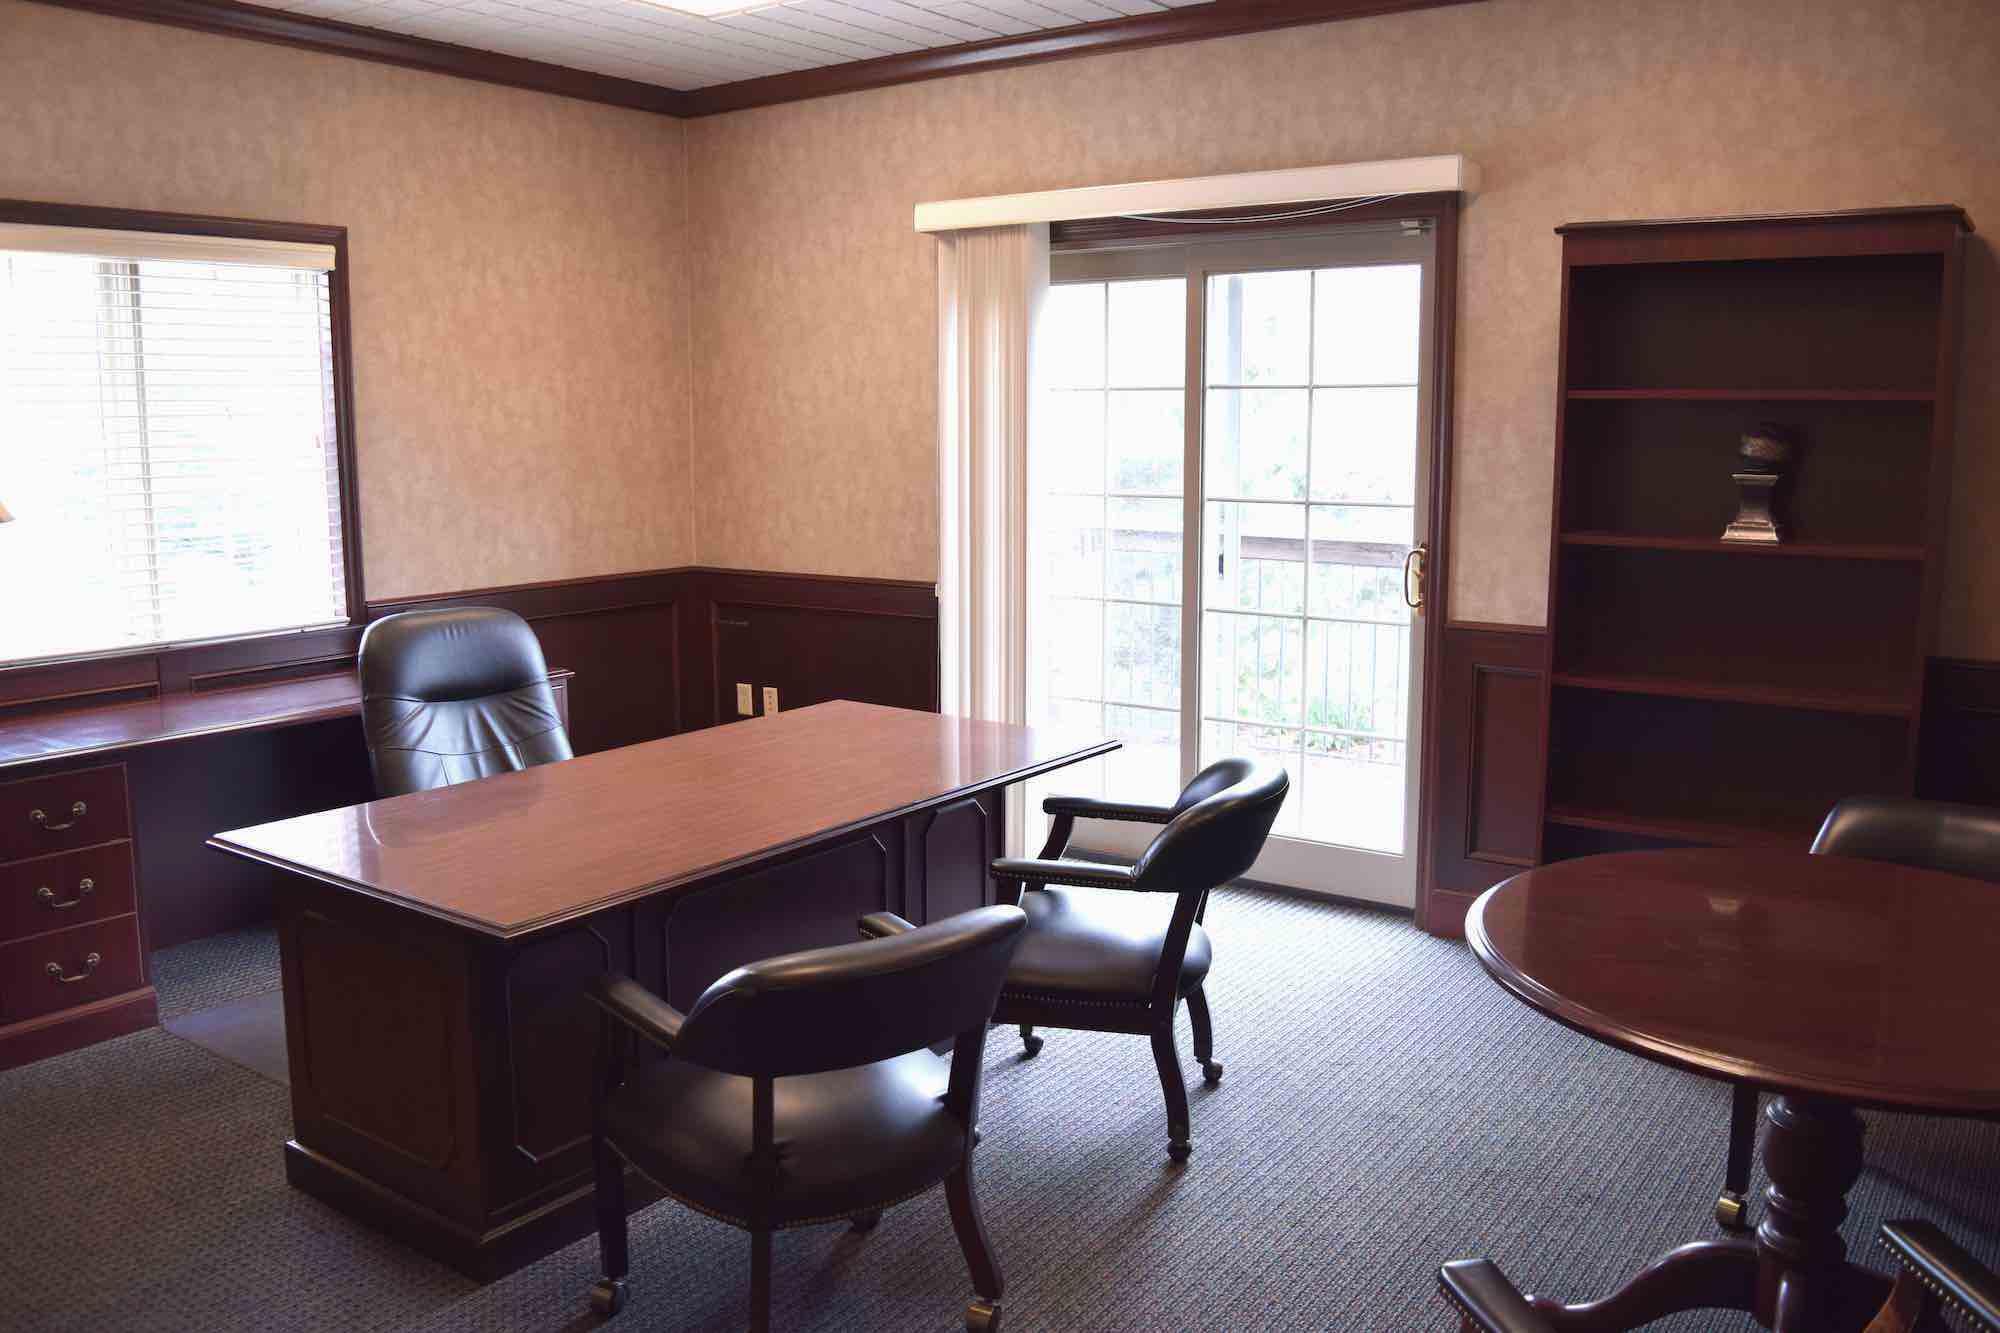 220 Office